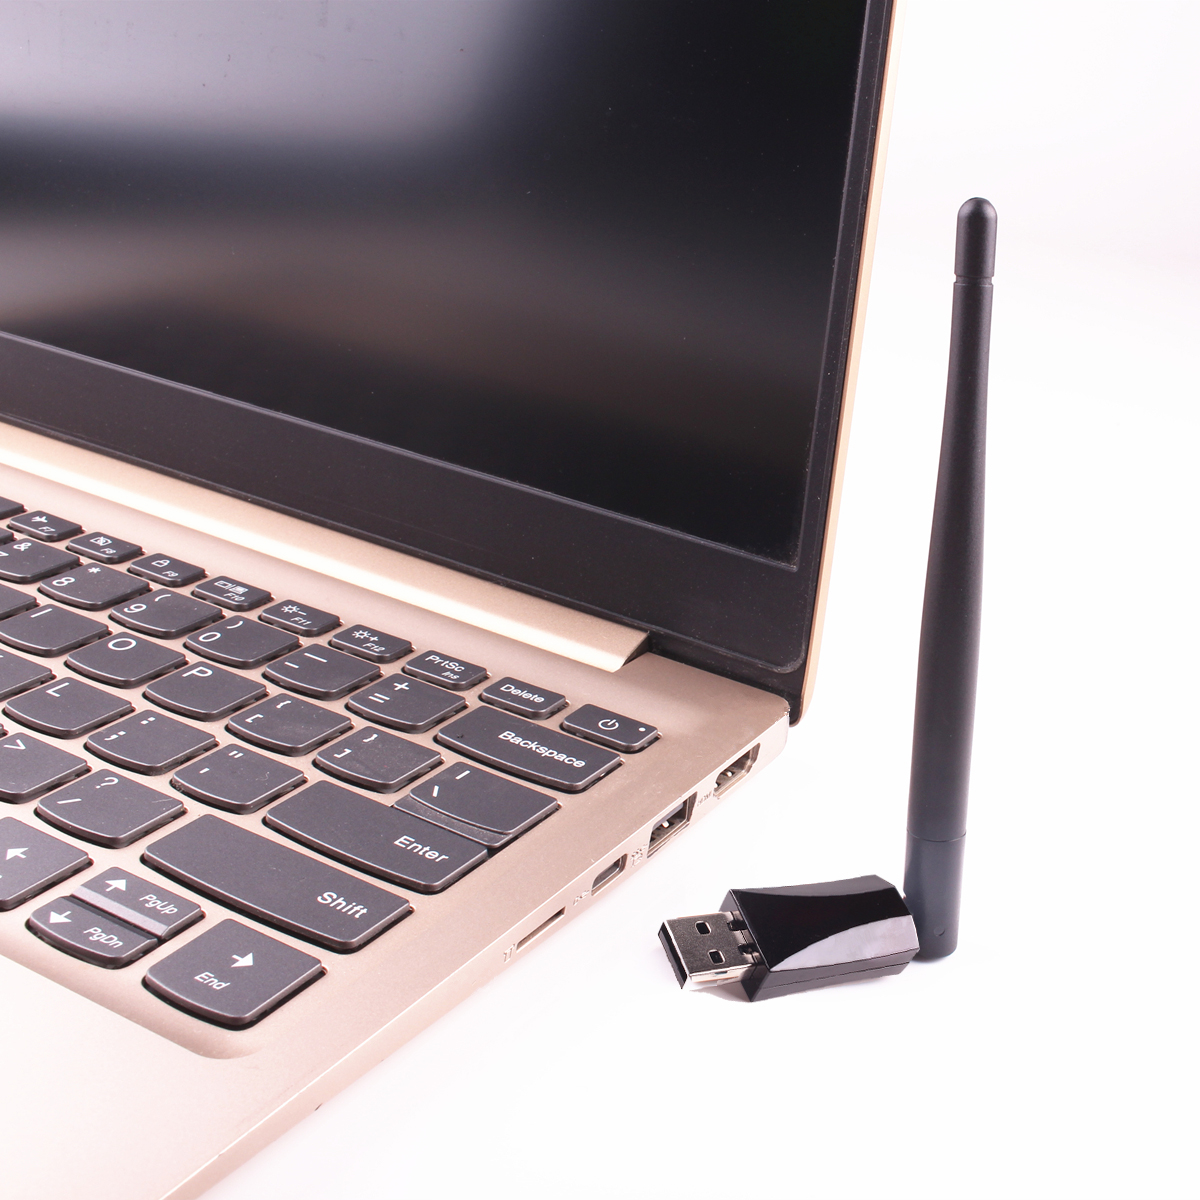 WIFI USB 7601 支持网络共享卫星接收机用 4